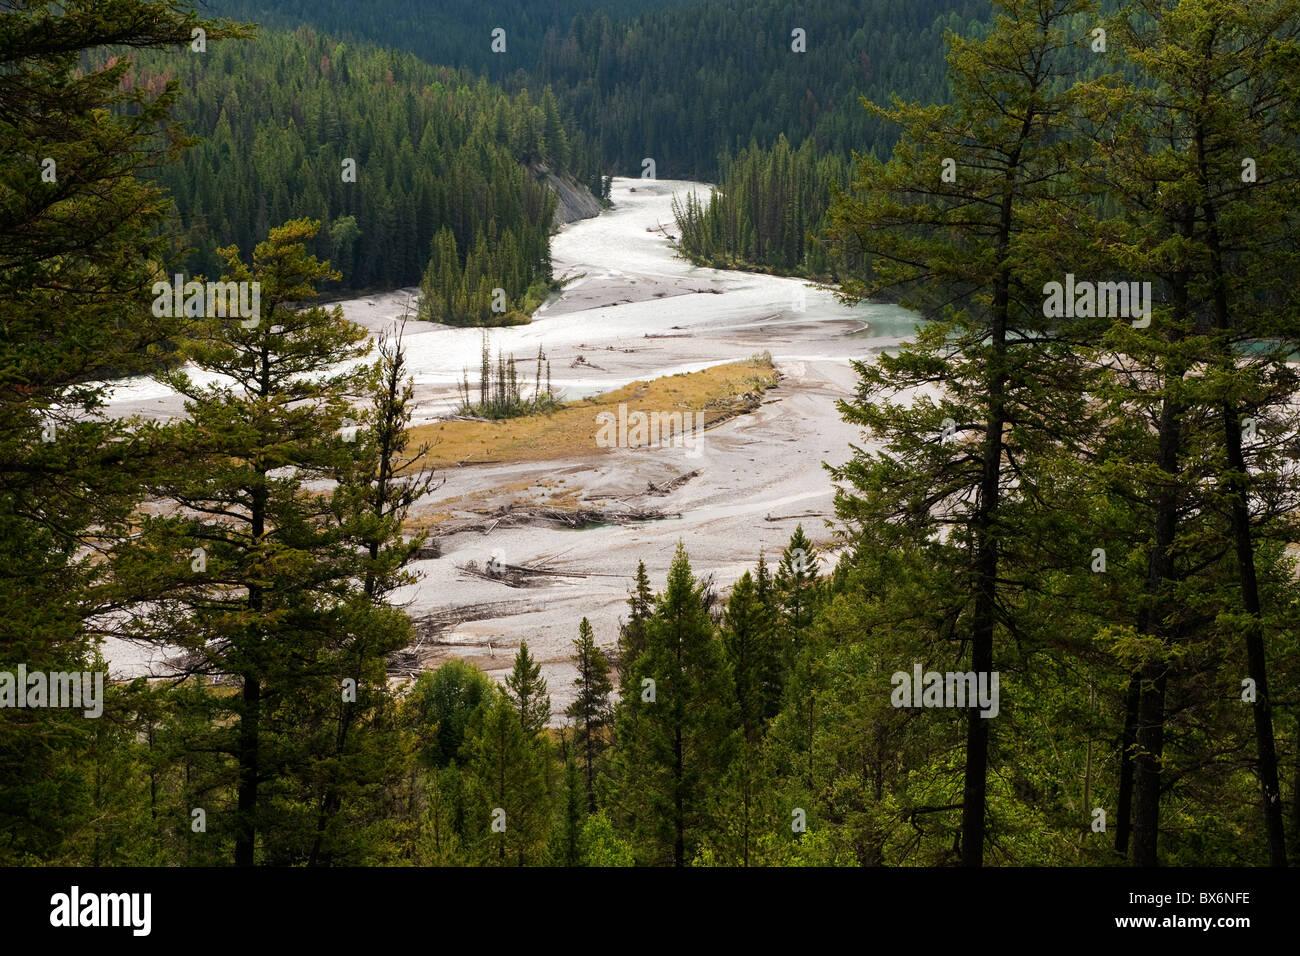 View from BC Highway 93 at Hector Gorge Viewpoint, Kootenay National Park, BC, Canada - Stock Image